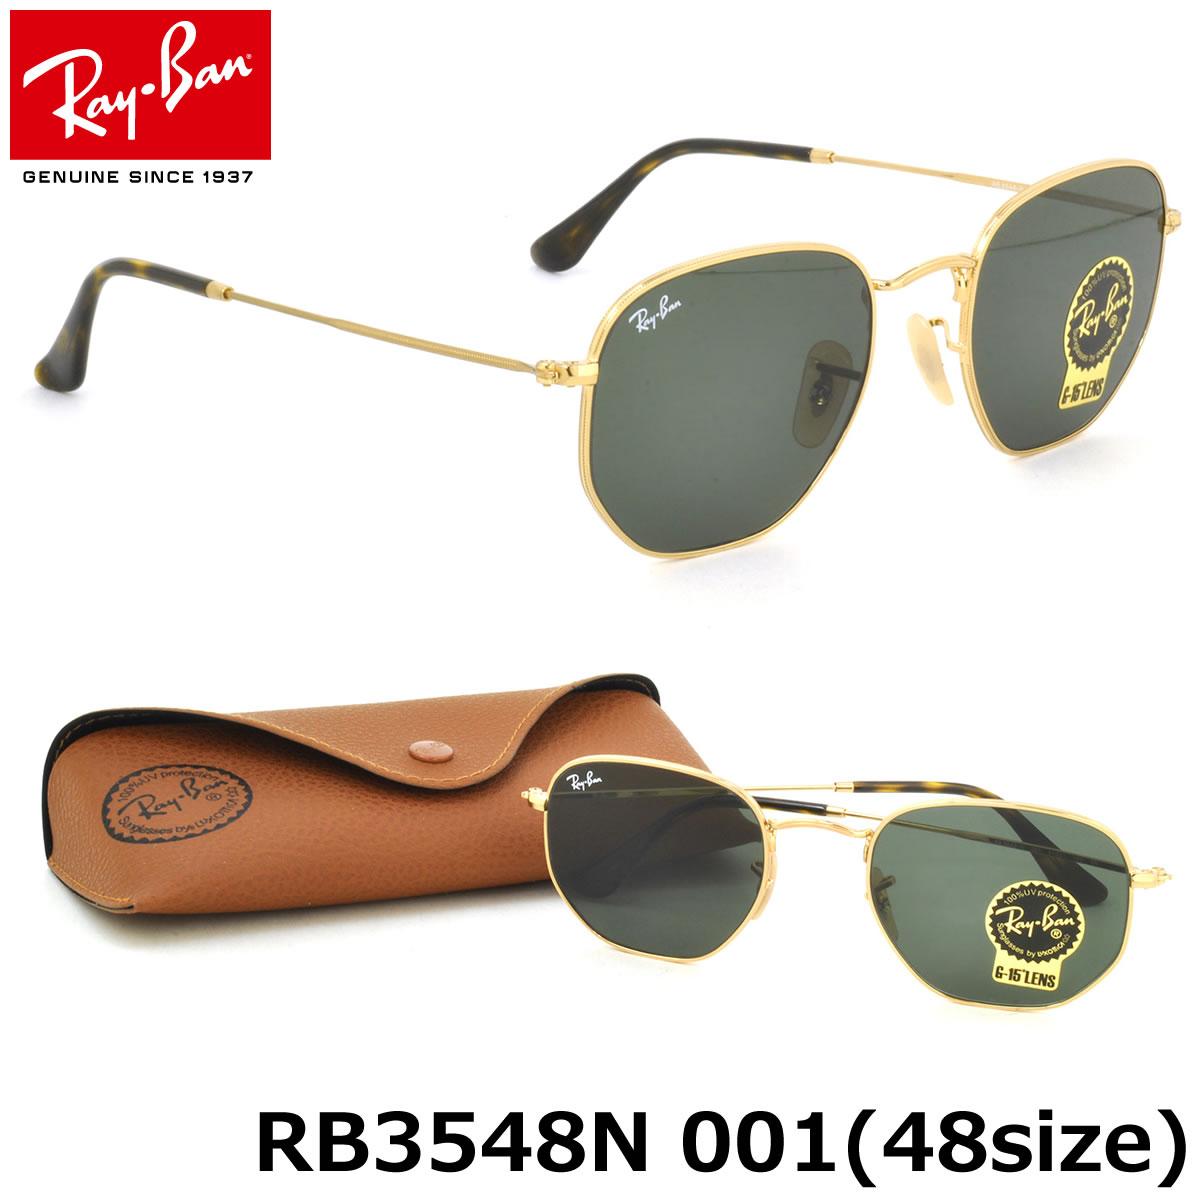 002f3169347 Ray Ban Sunglasses Warranty Tol8 « One More Soul